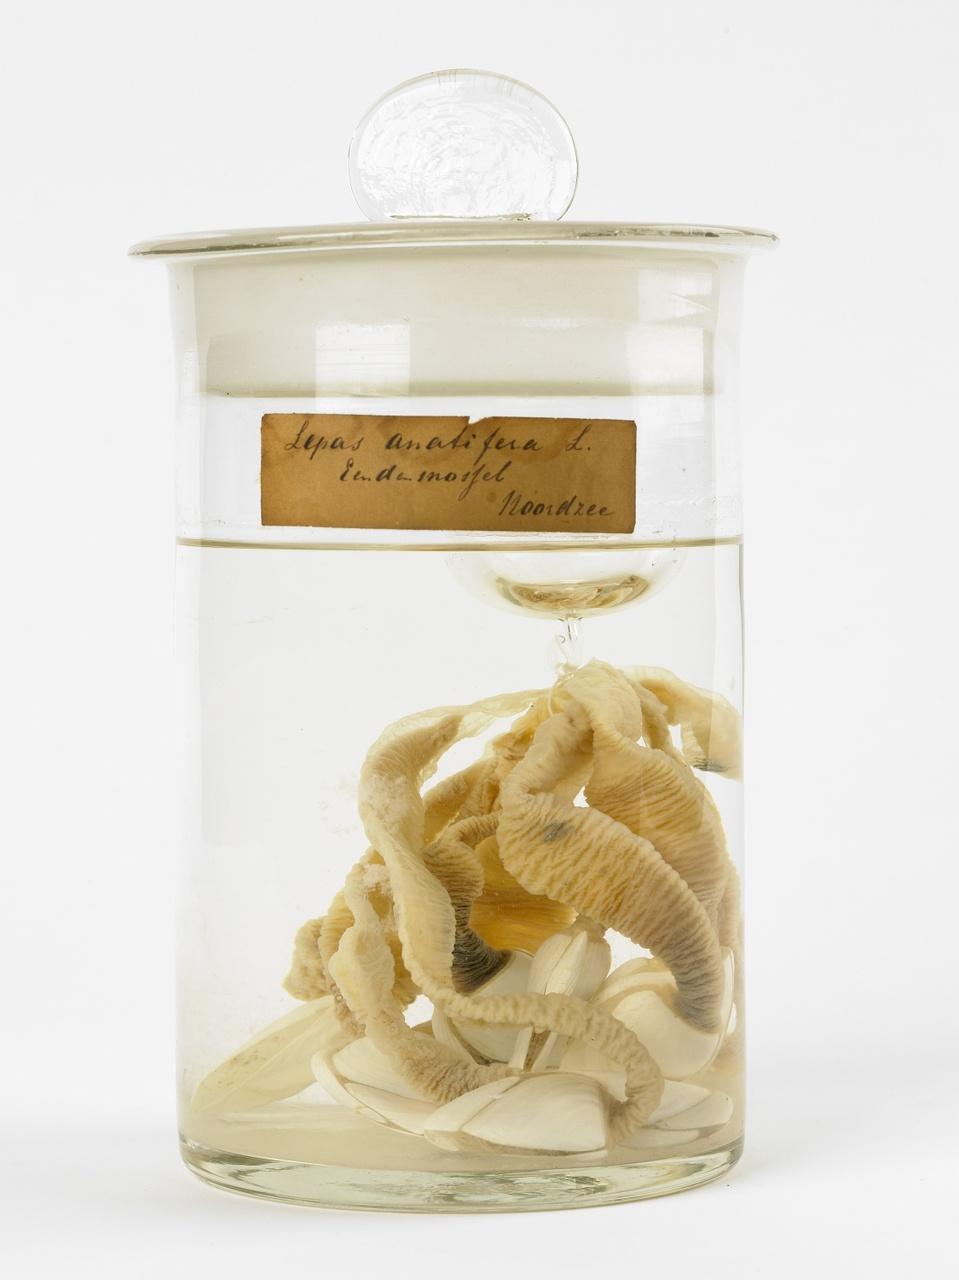 Lepas anatifera Linnaeus, 1758, Gewone eendemossel, alcoholpreparaat